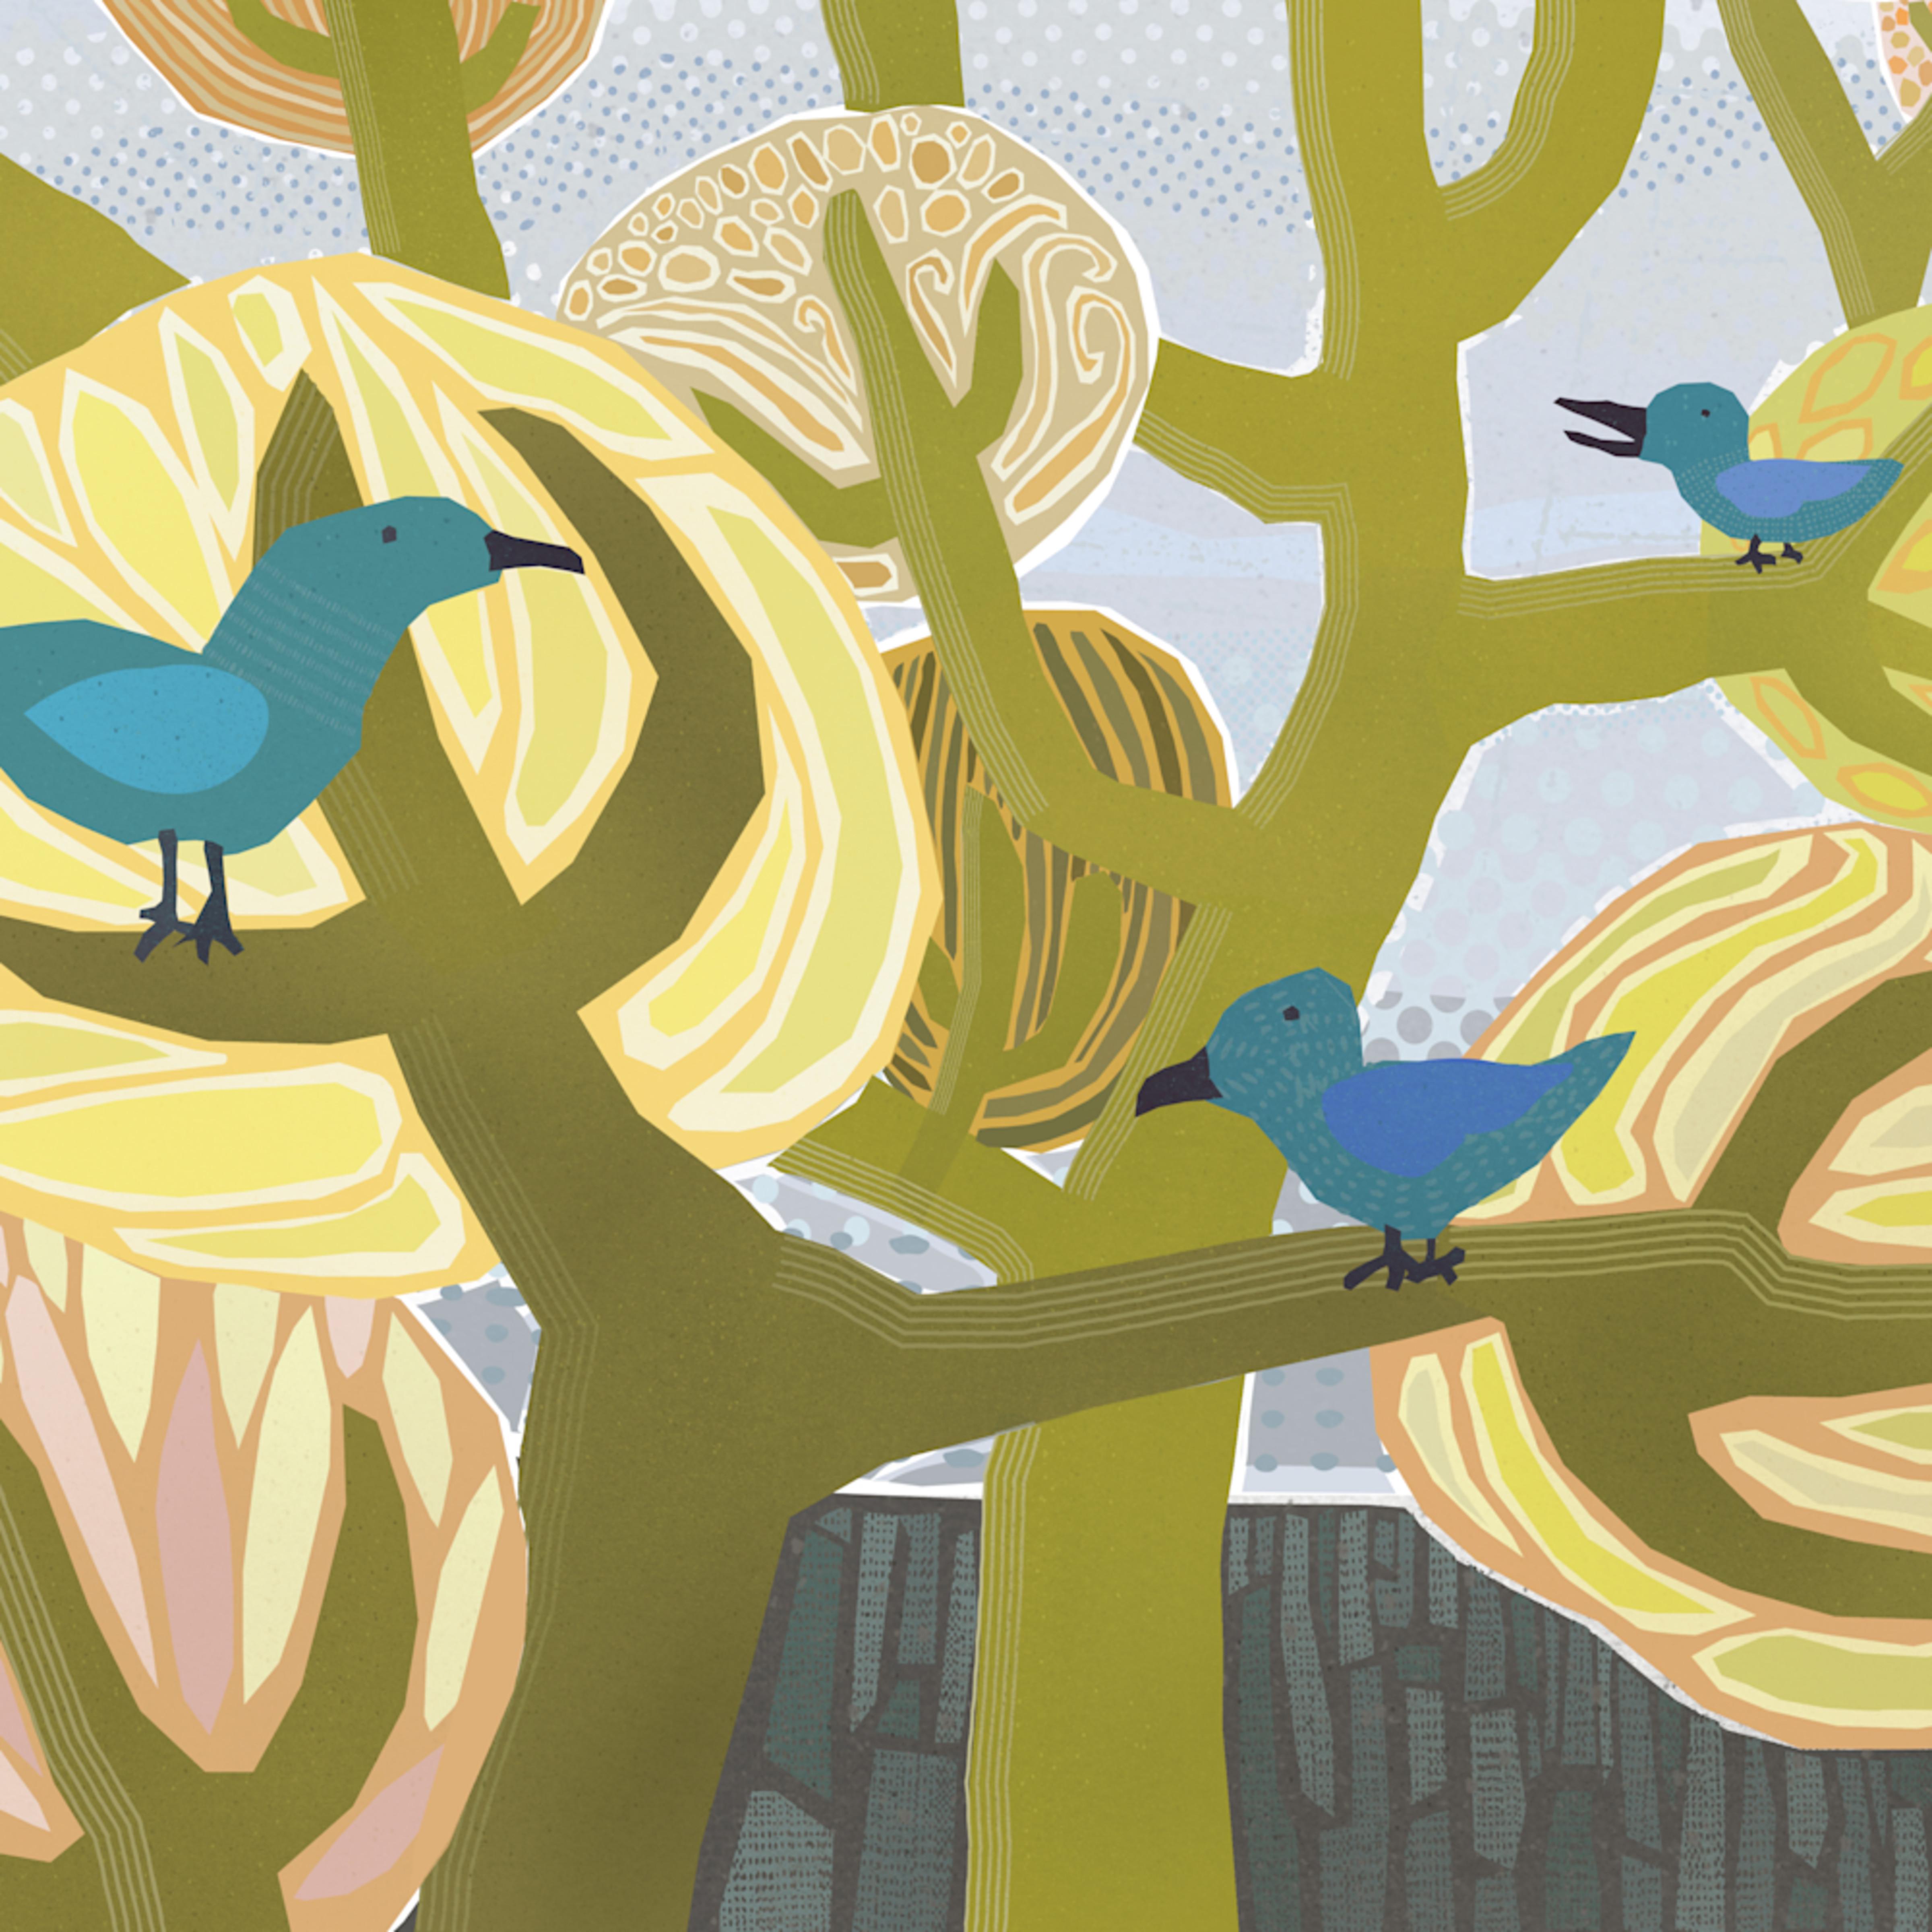 Three blue birds andrew daniel ituvcu